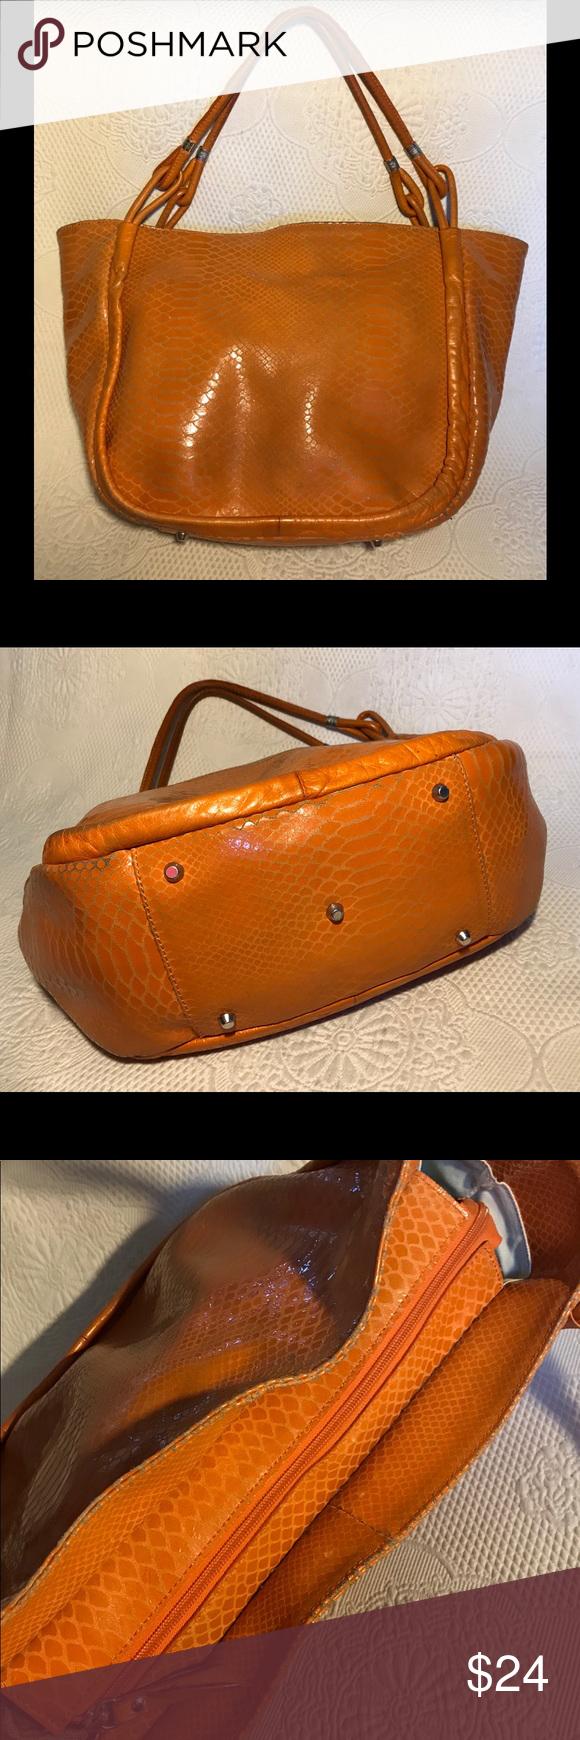 1df32cefcf Roberta Gandolfi Orange snake print leather bag Roberta Gandolfi orange  leather handbag embossed with a snakeskin